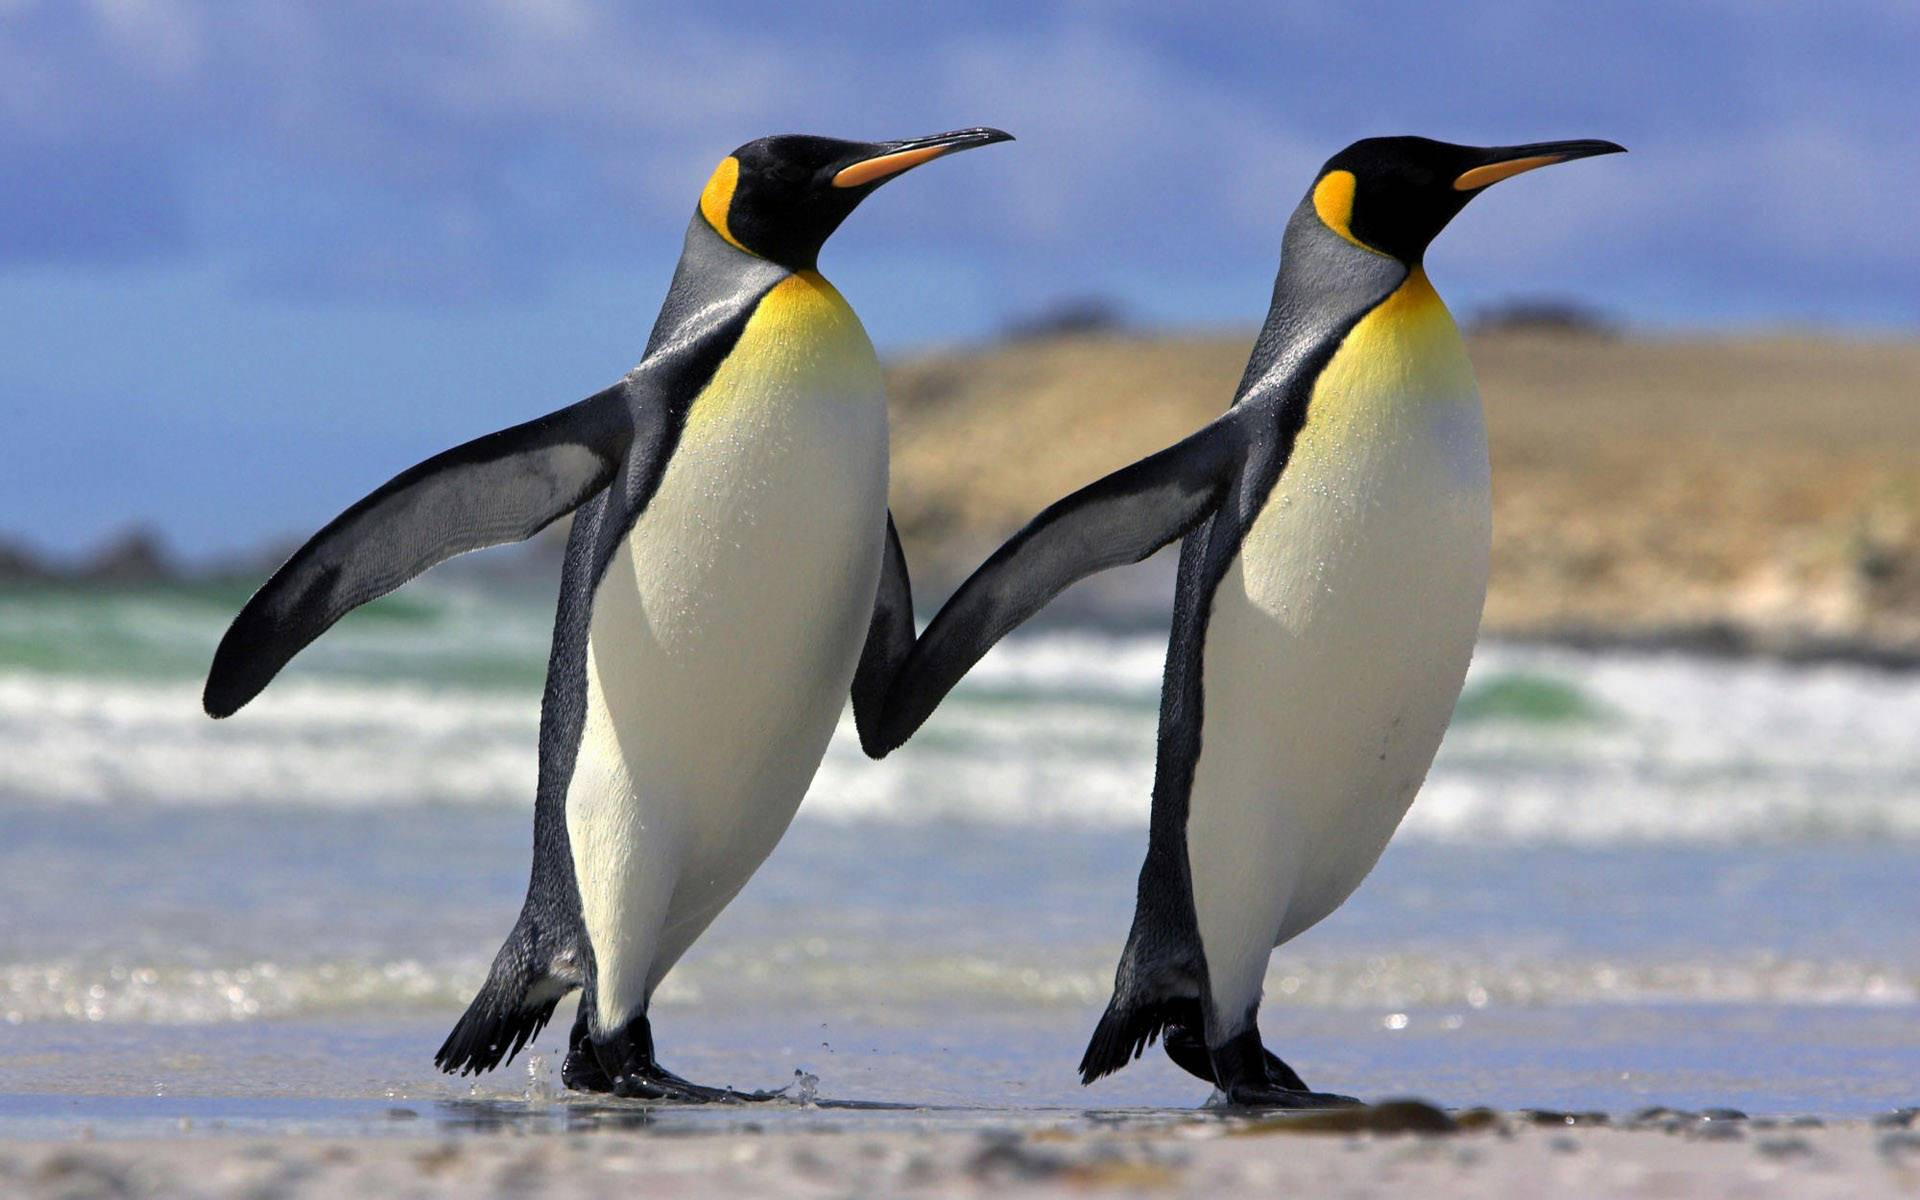 http://3.bp.blogspot.com/-pO17E0z6WpA/T0yHxJY5LMI/AAAAAAAAH9M/Fg2WWa7C-ao/s1920/penguin-parade-wallpaper.jpg